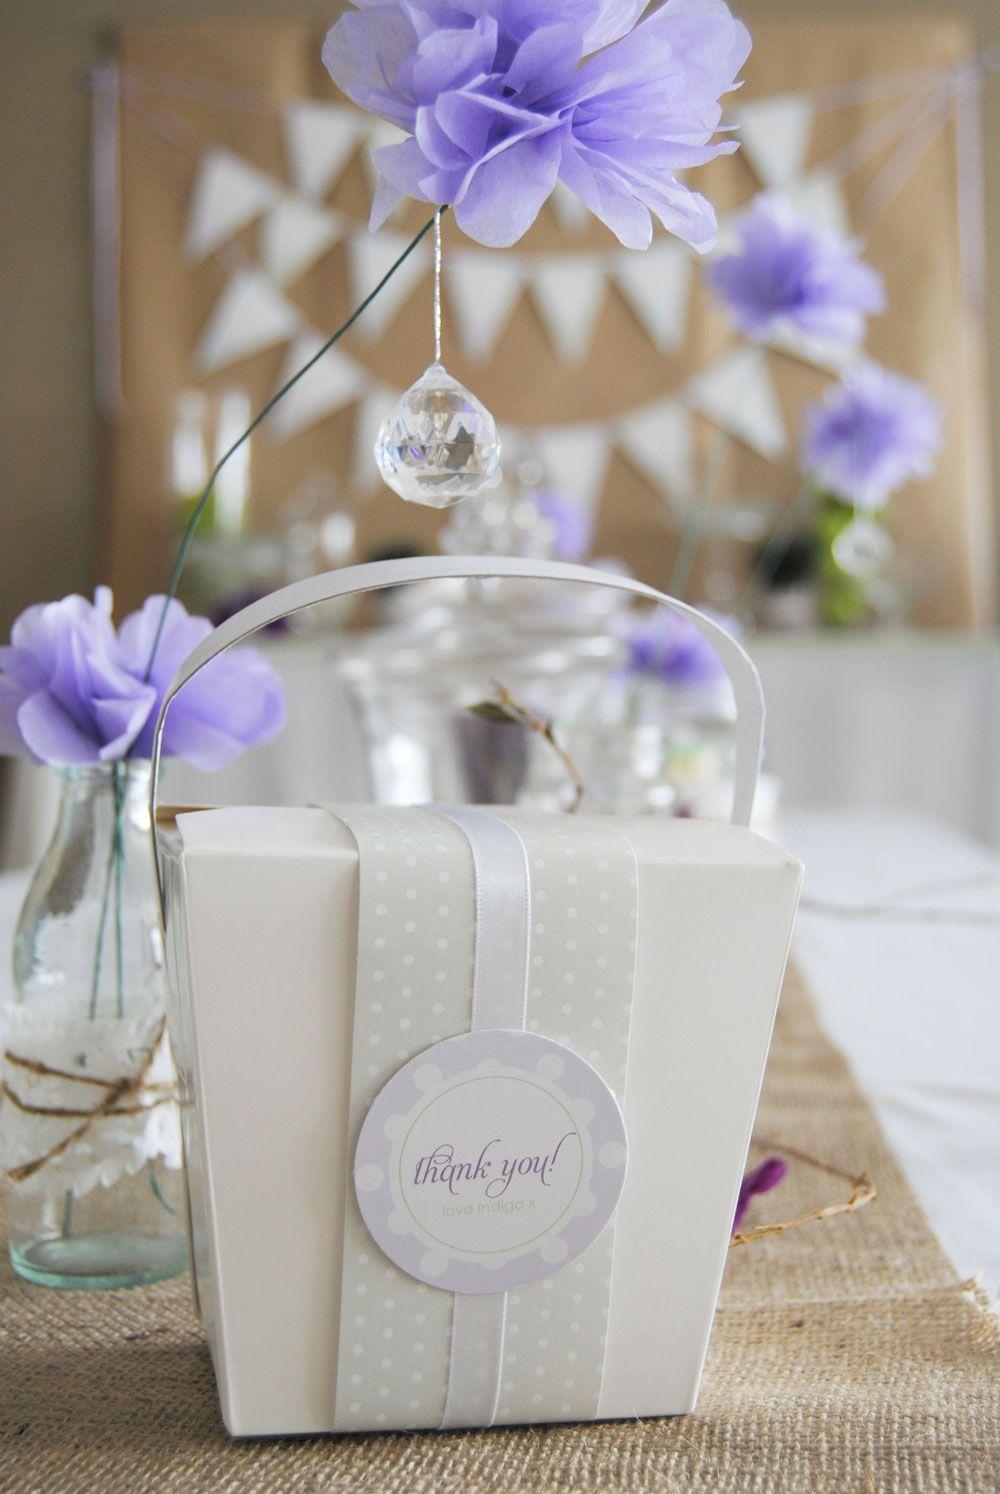 Sweet Little Parties   Party Ideas   Pinterest   Goodie bags, Favors ...